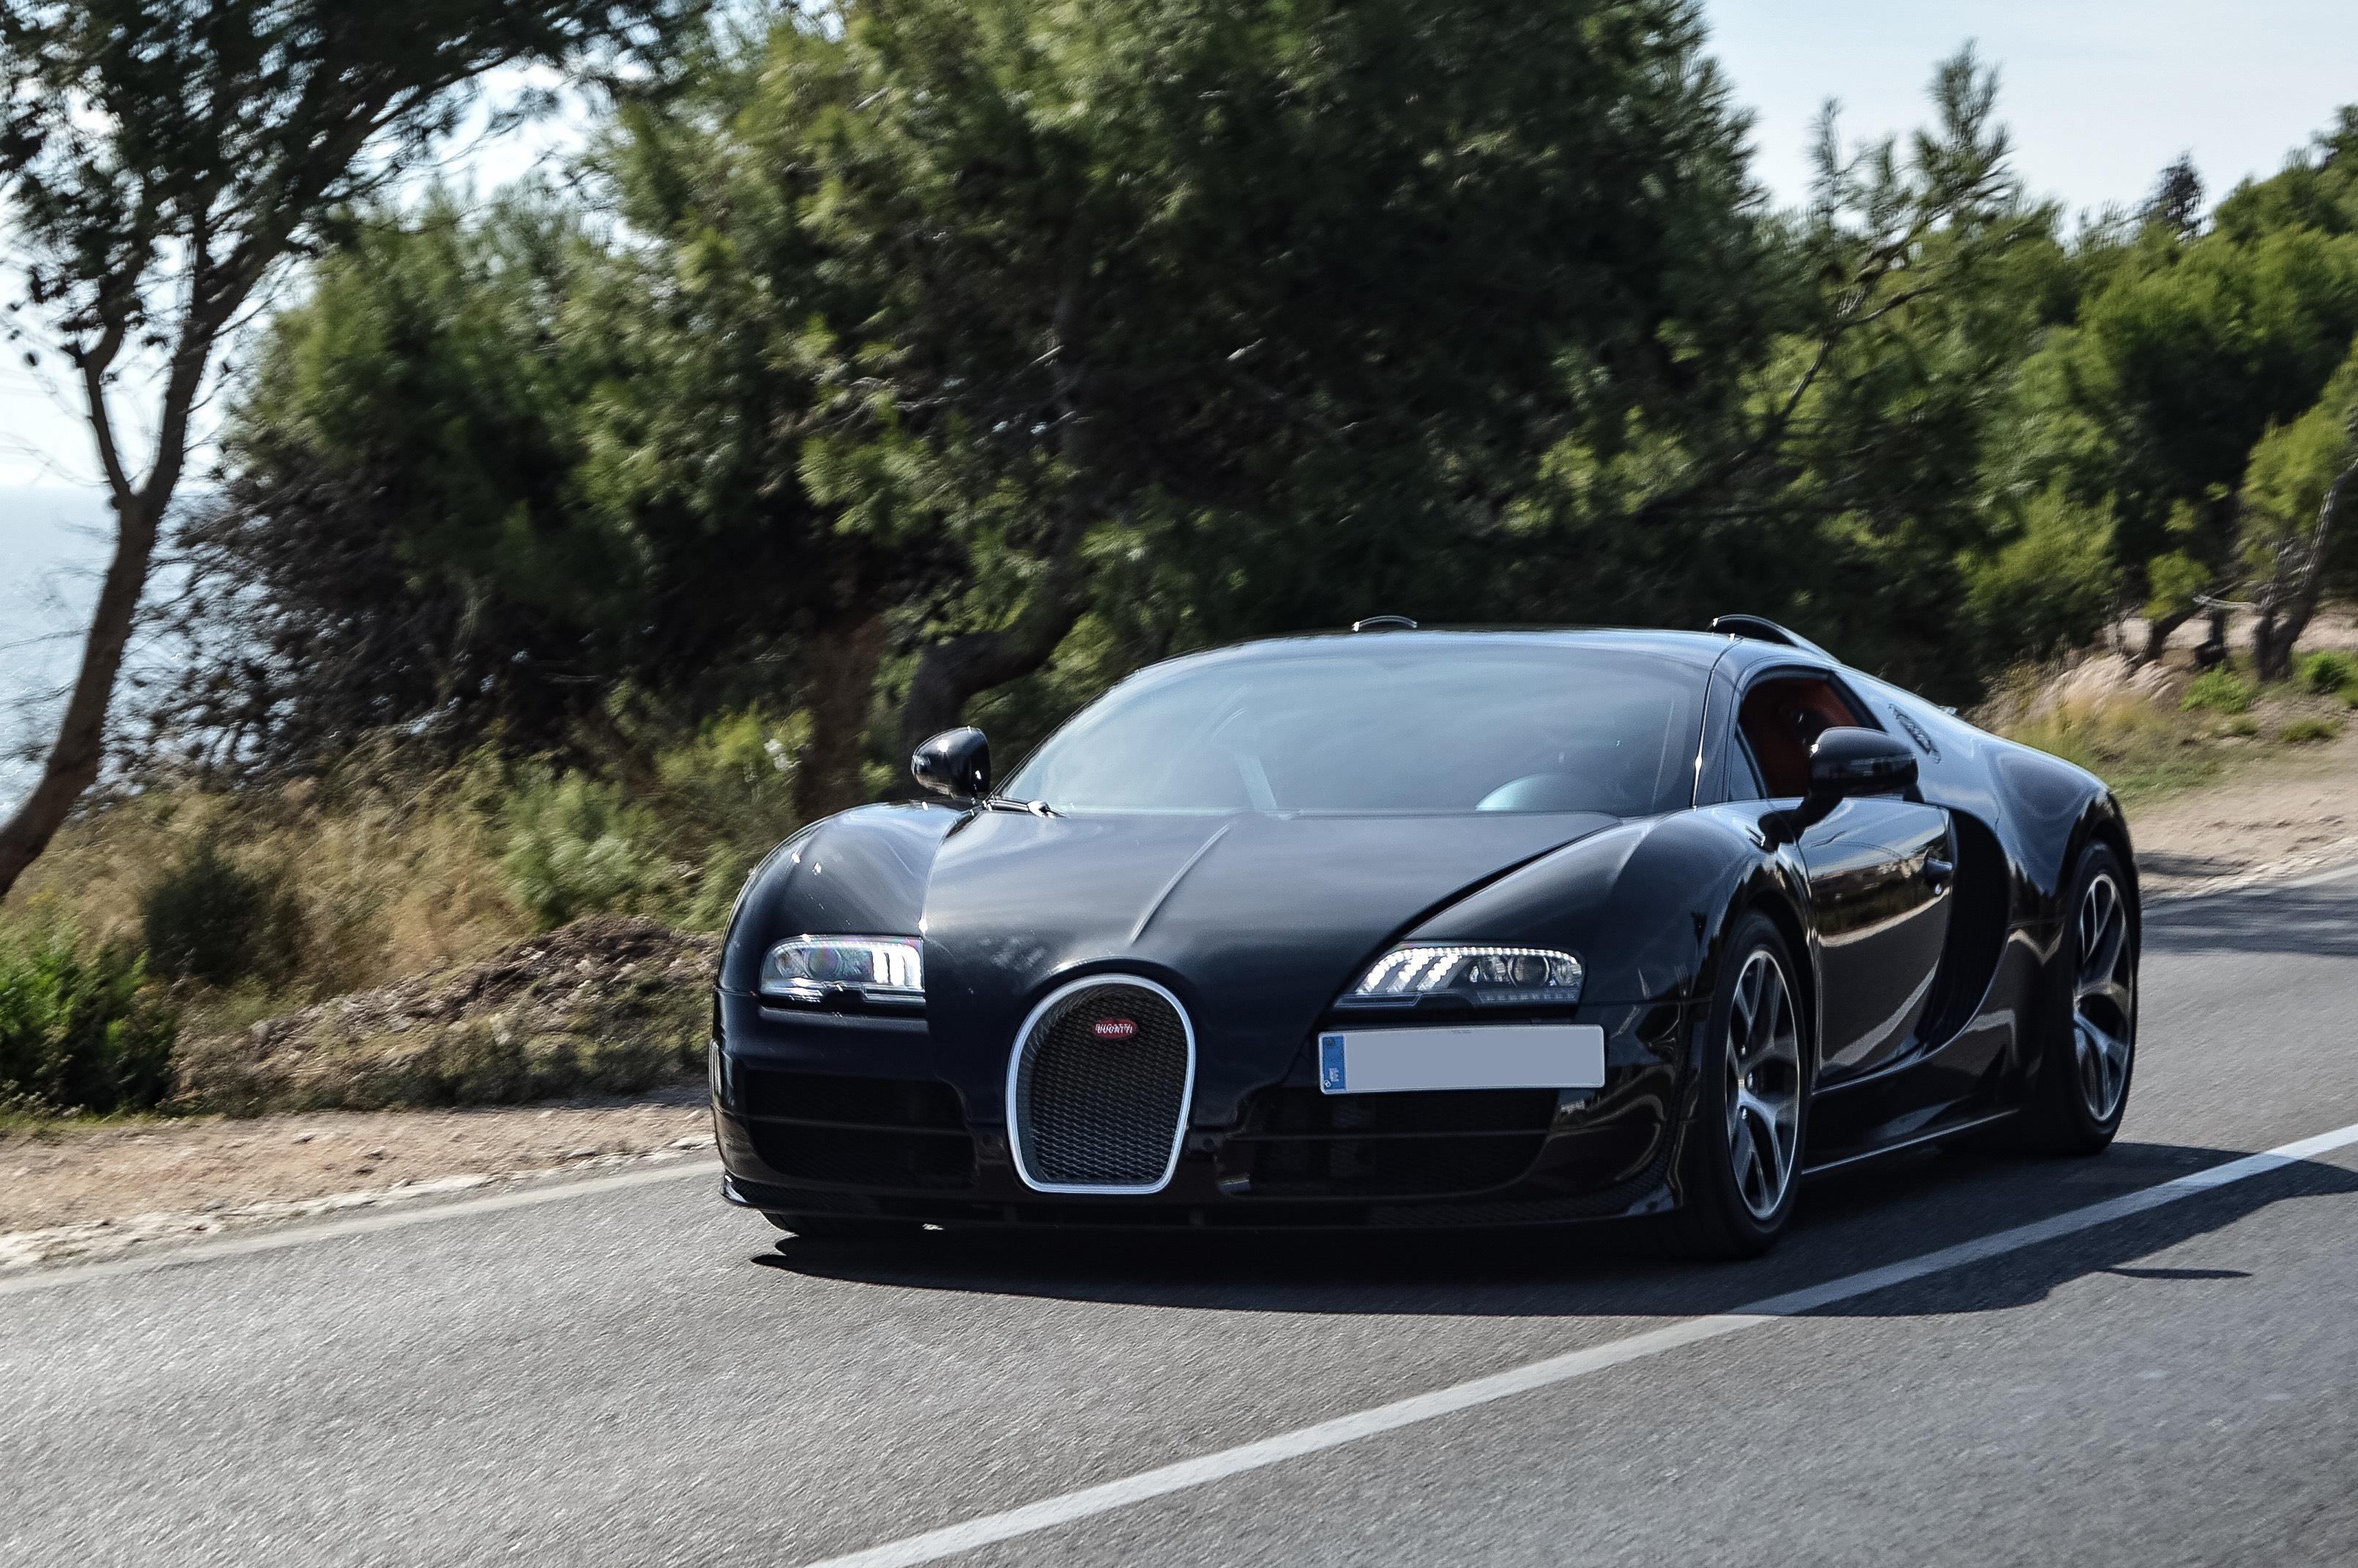 1a6bc187a8b68b79397fd34e5978a2ad Terrific New Bugatti Veyron Grand Sport Vitesse Cars Trend